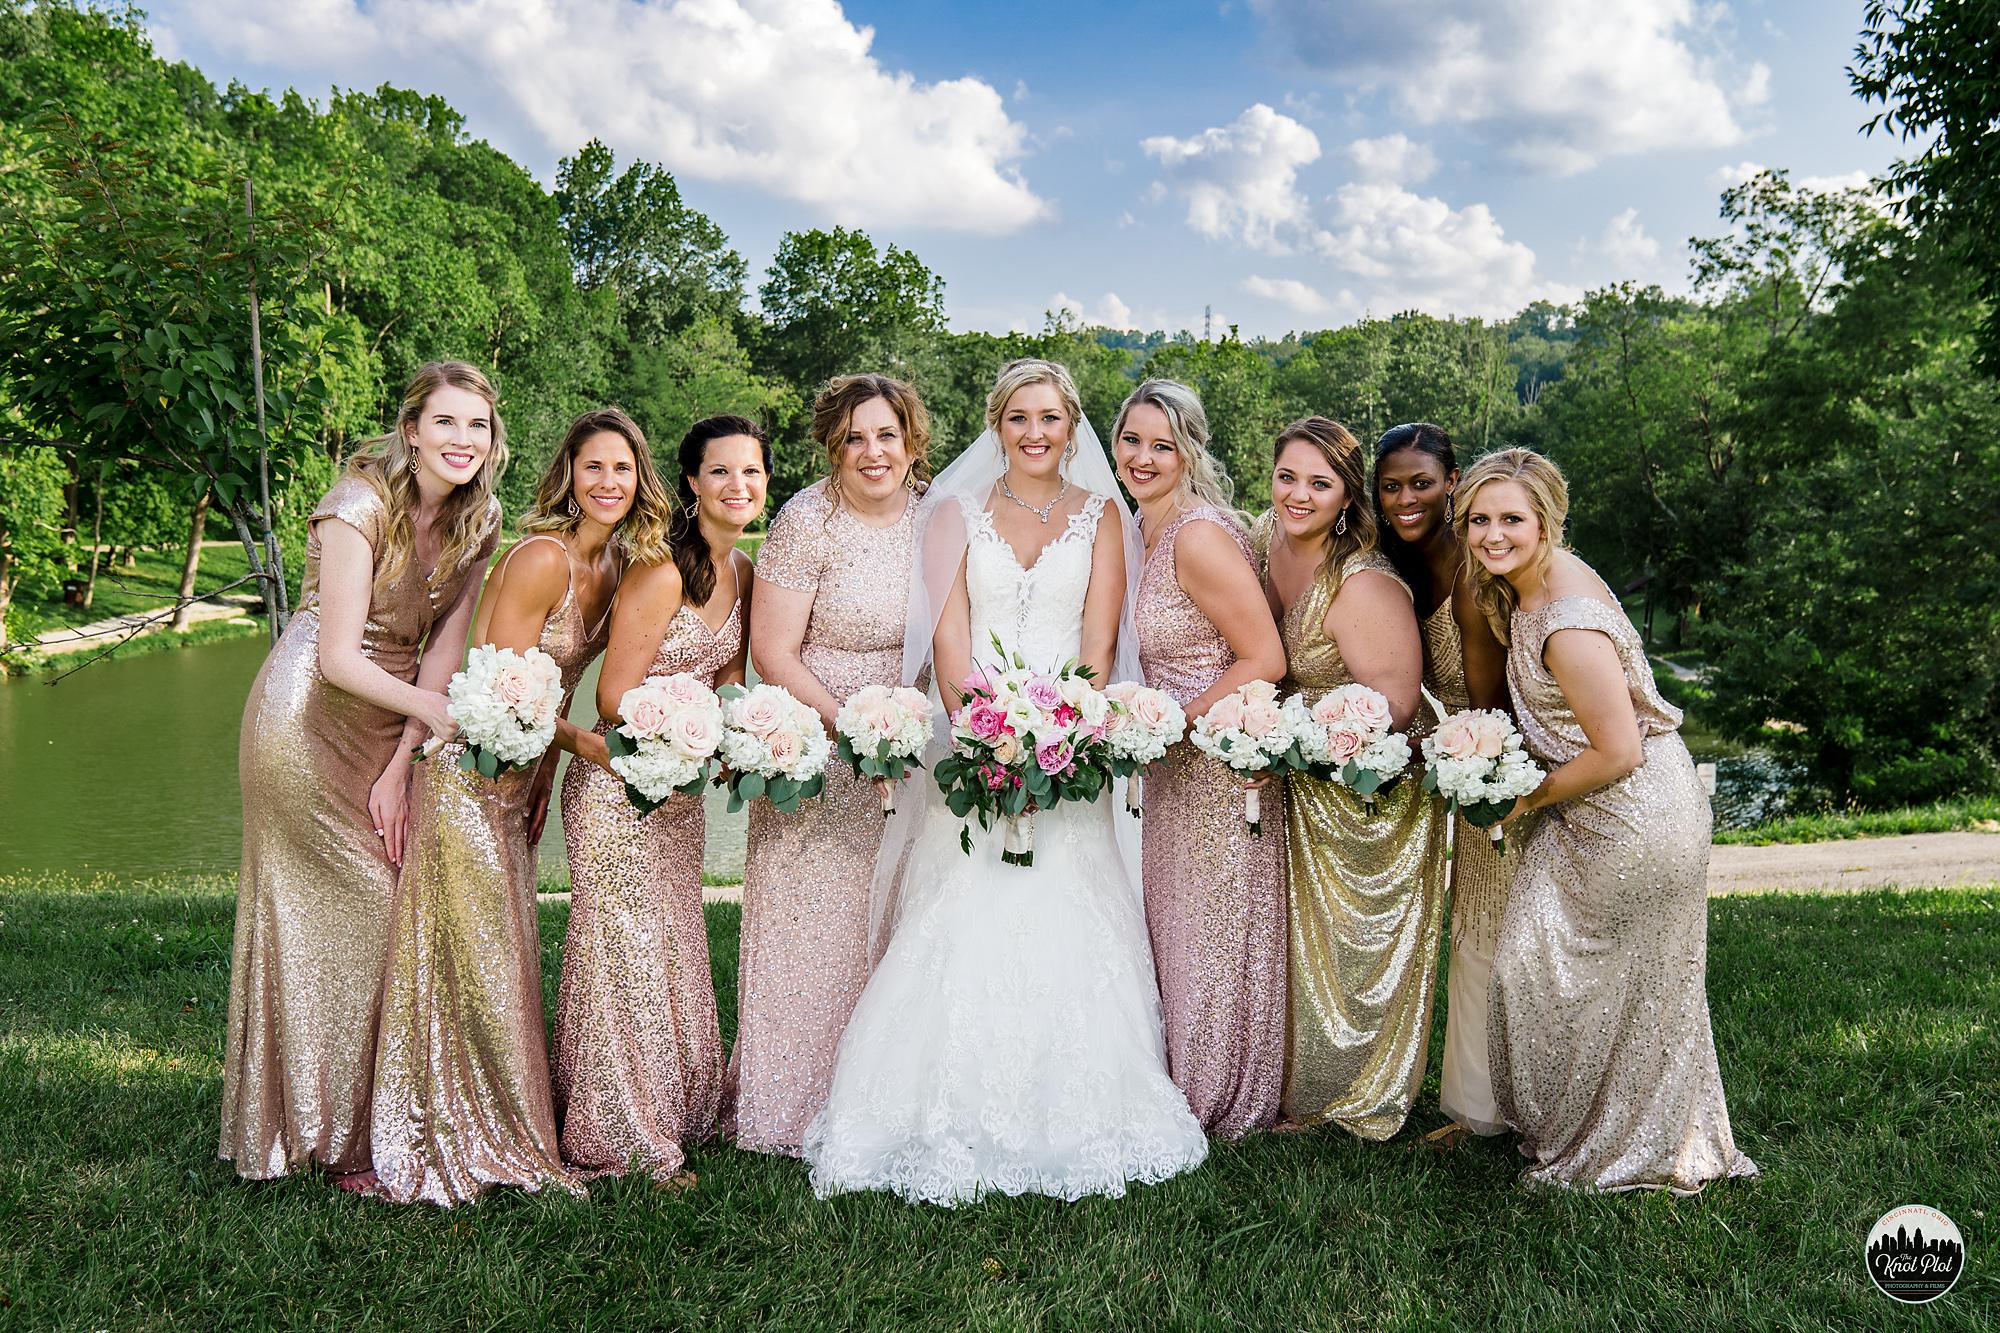 Southgate-Community-Center-KY-Wedding-Photography-16.jpg